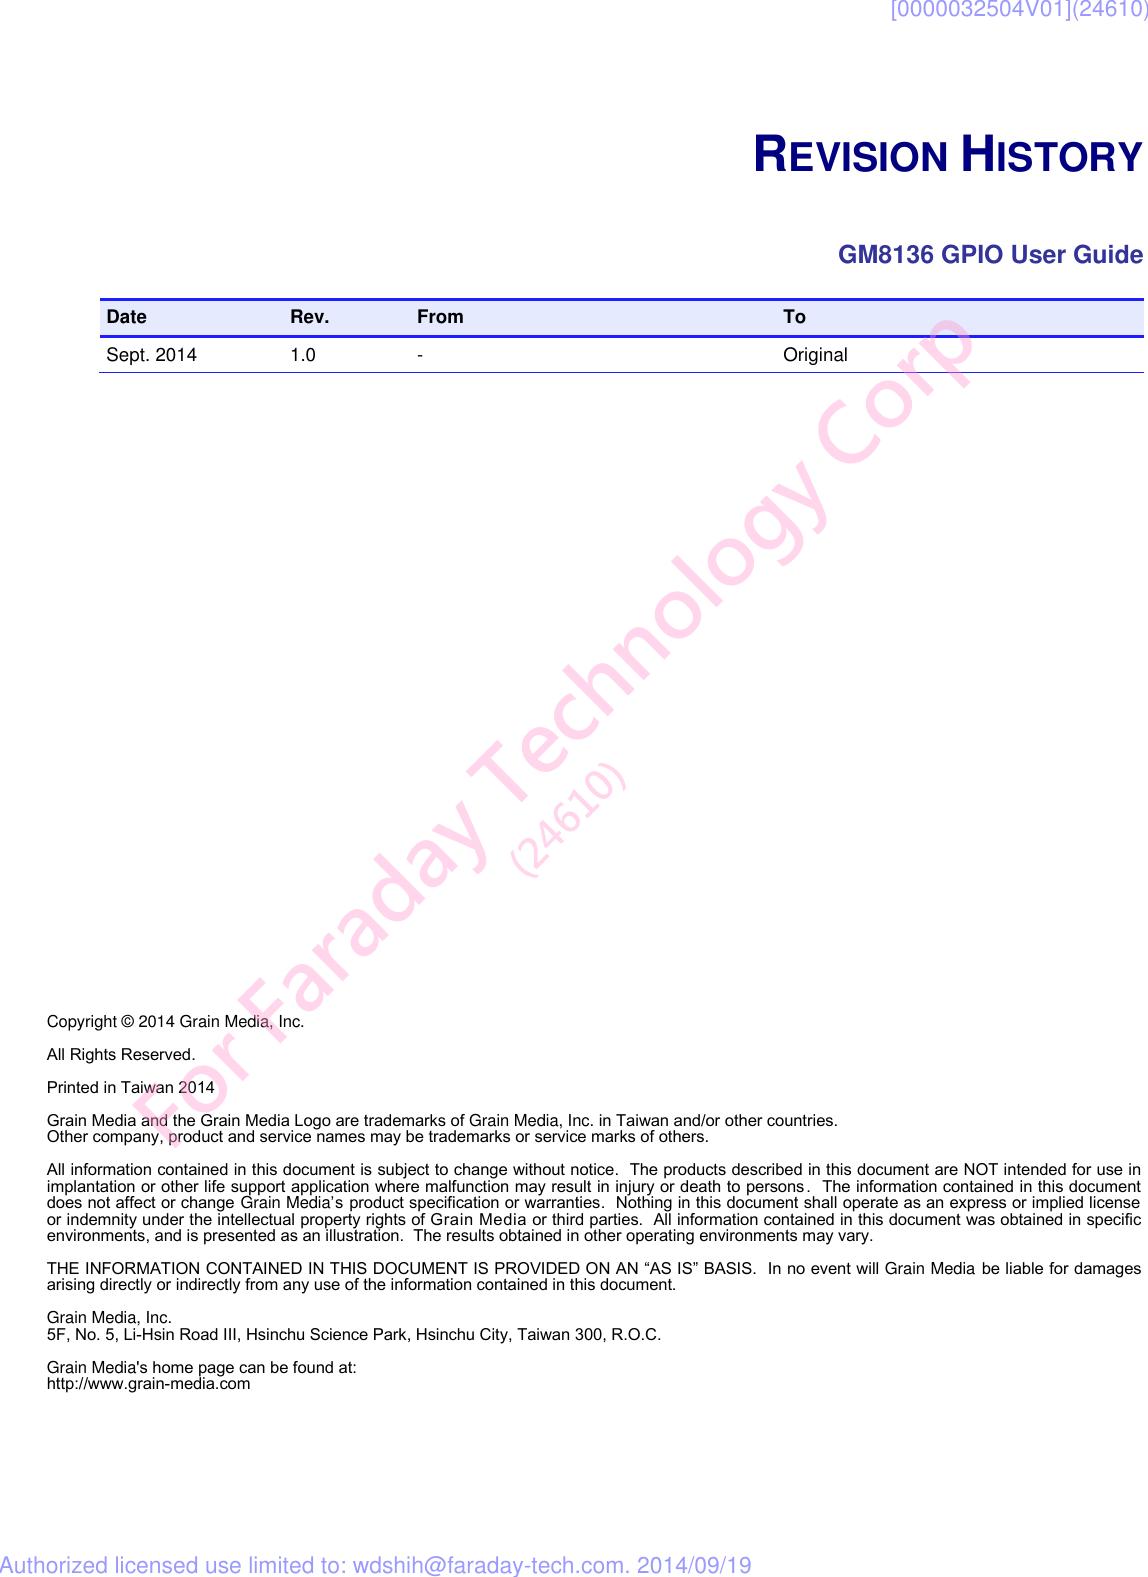 Description GM8136 GPIO User Guide V1 0